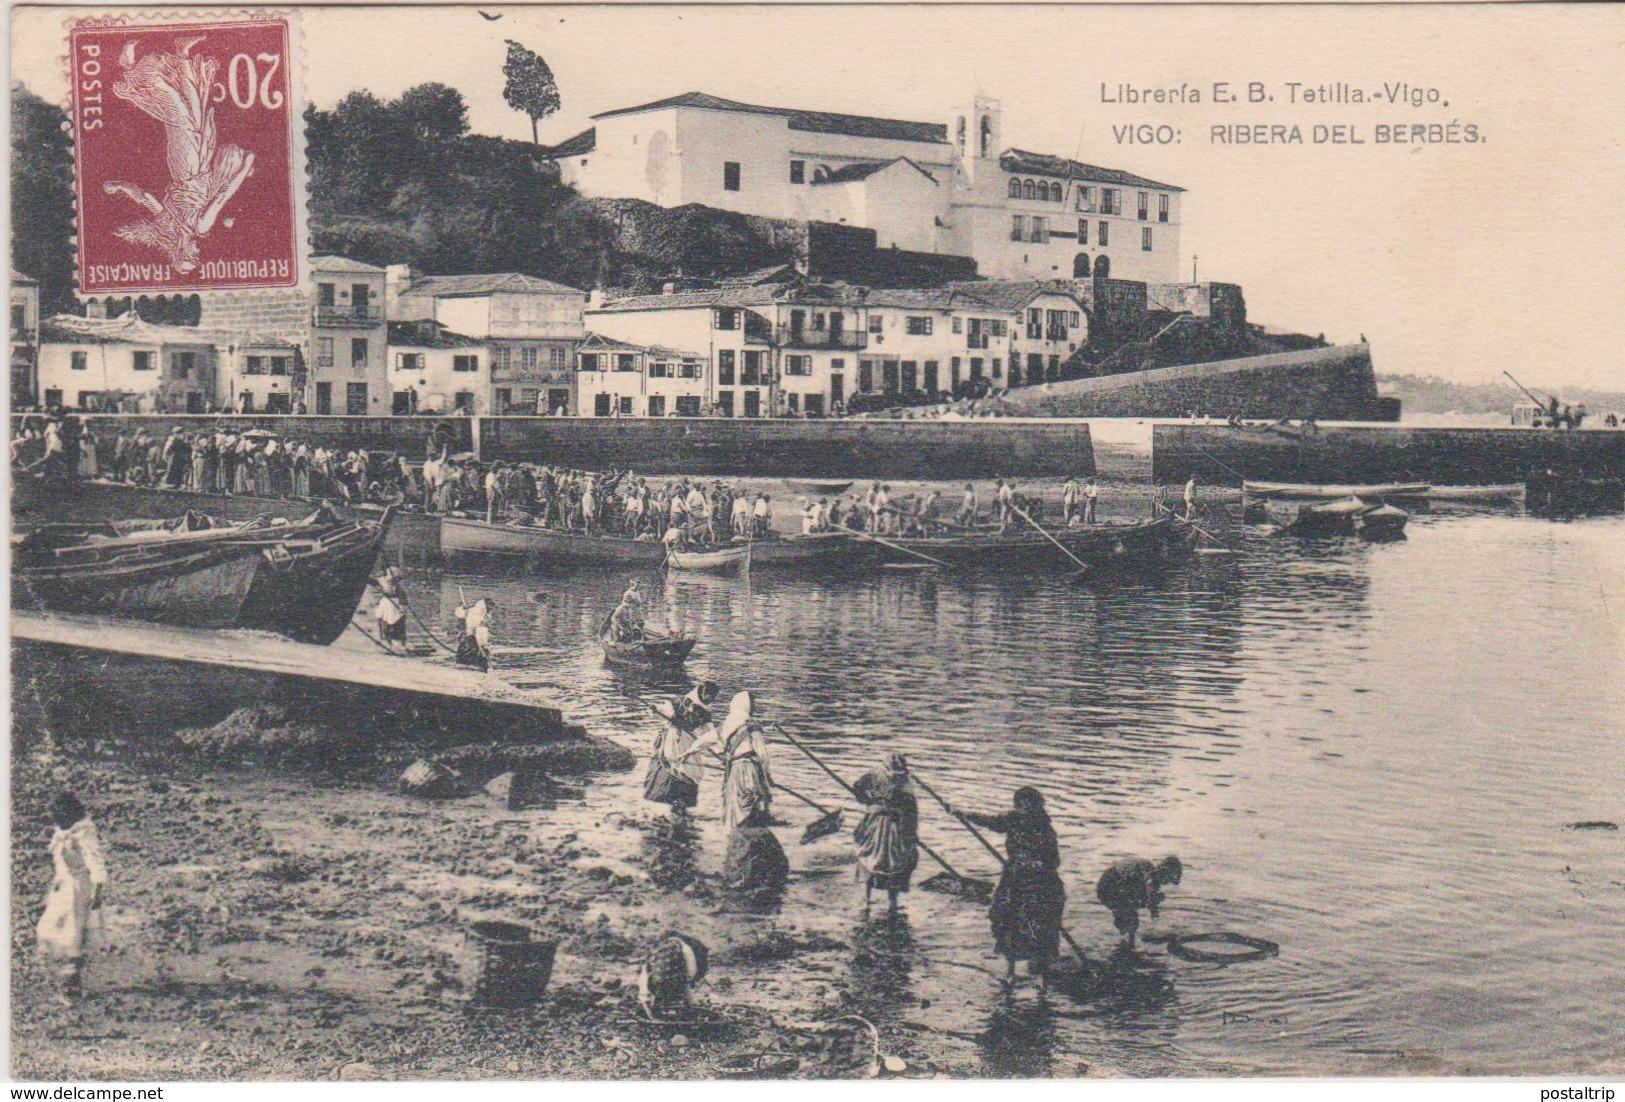 VIGO RIBERA DEL BERBES - La Coruña